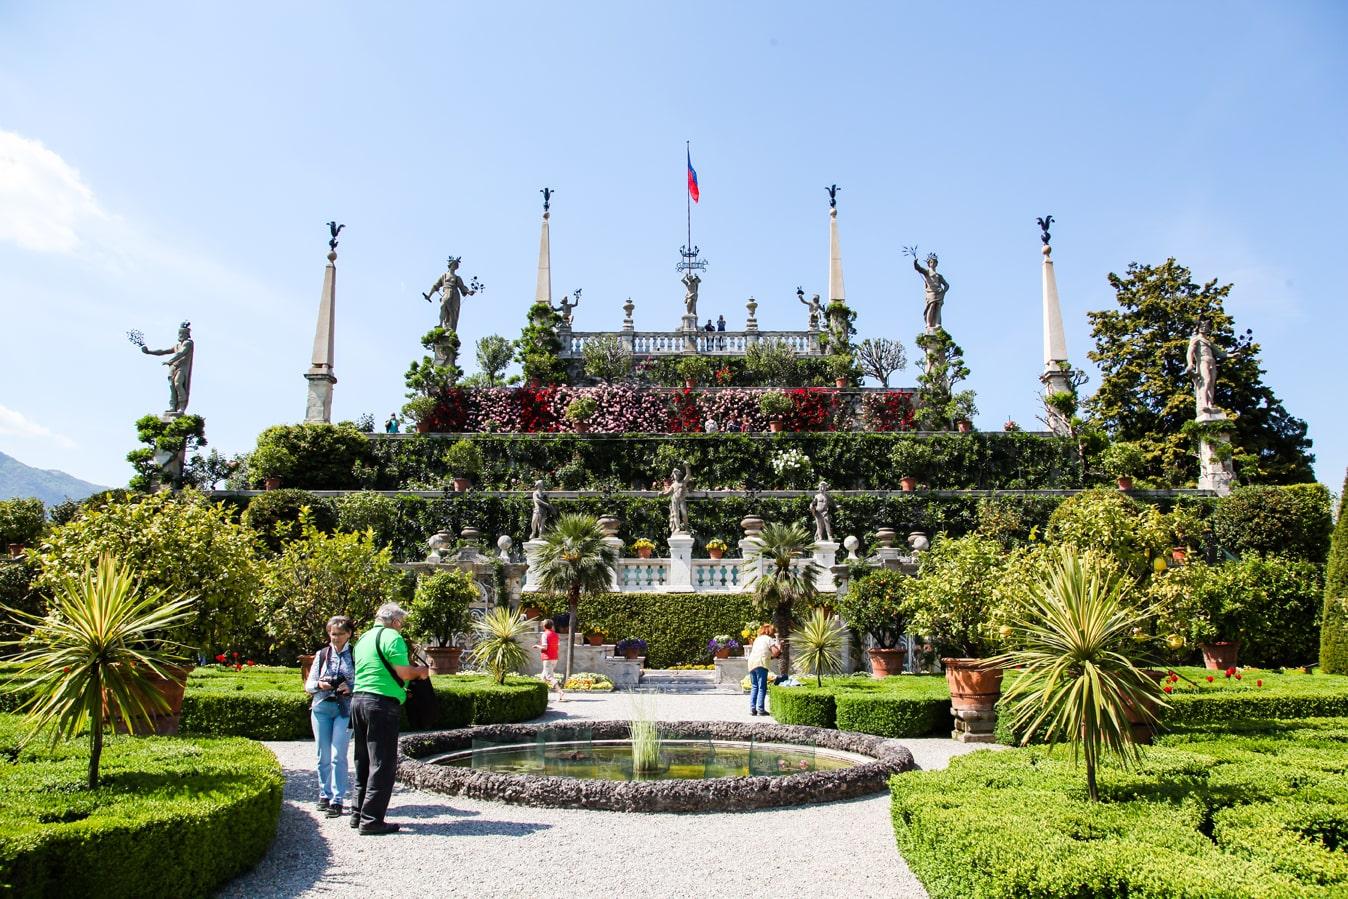 фонтан Боромео, фонтан, фонтан острова Мадре, фонтан в Италии